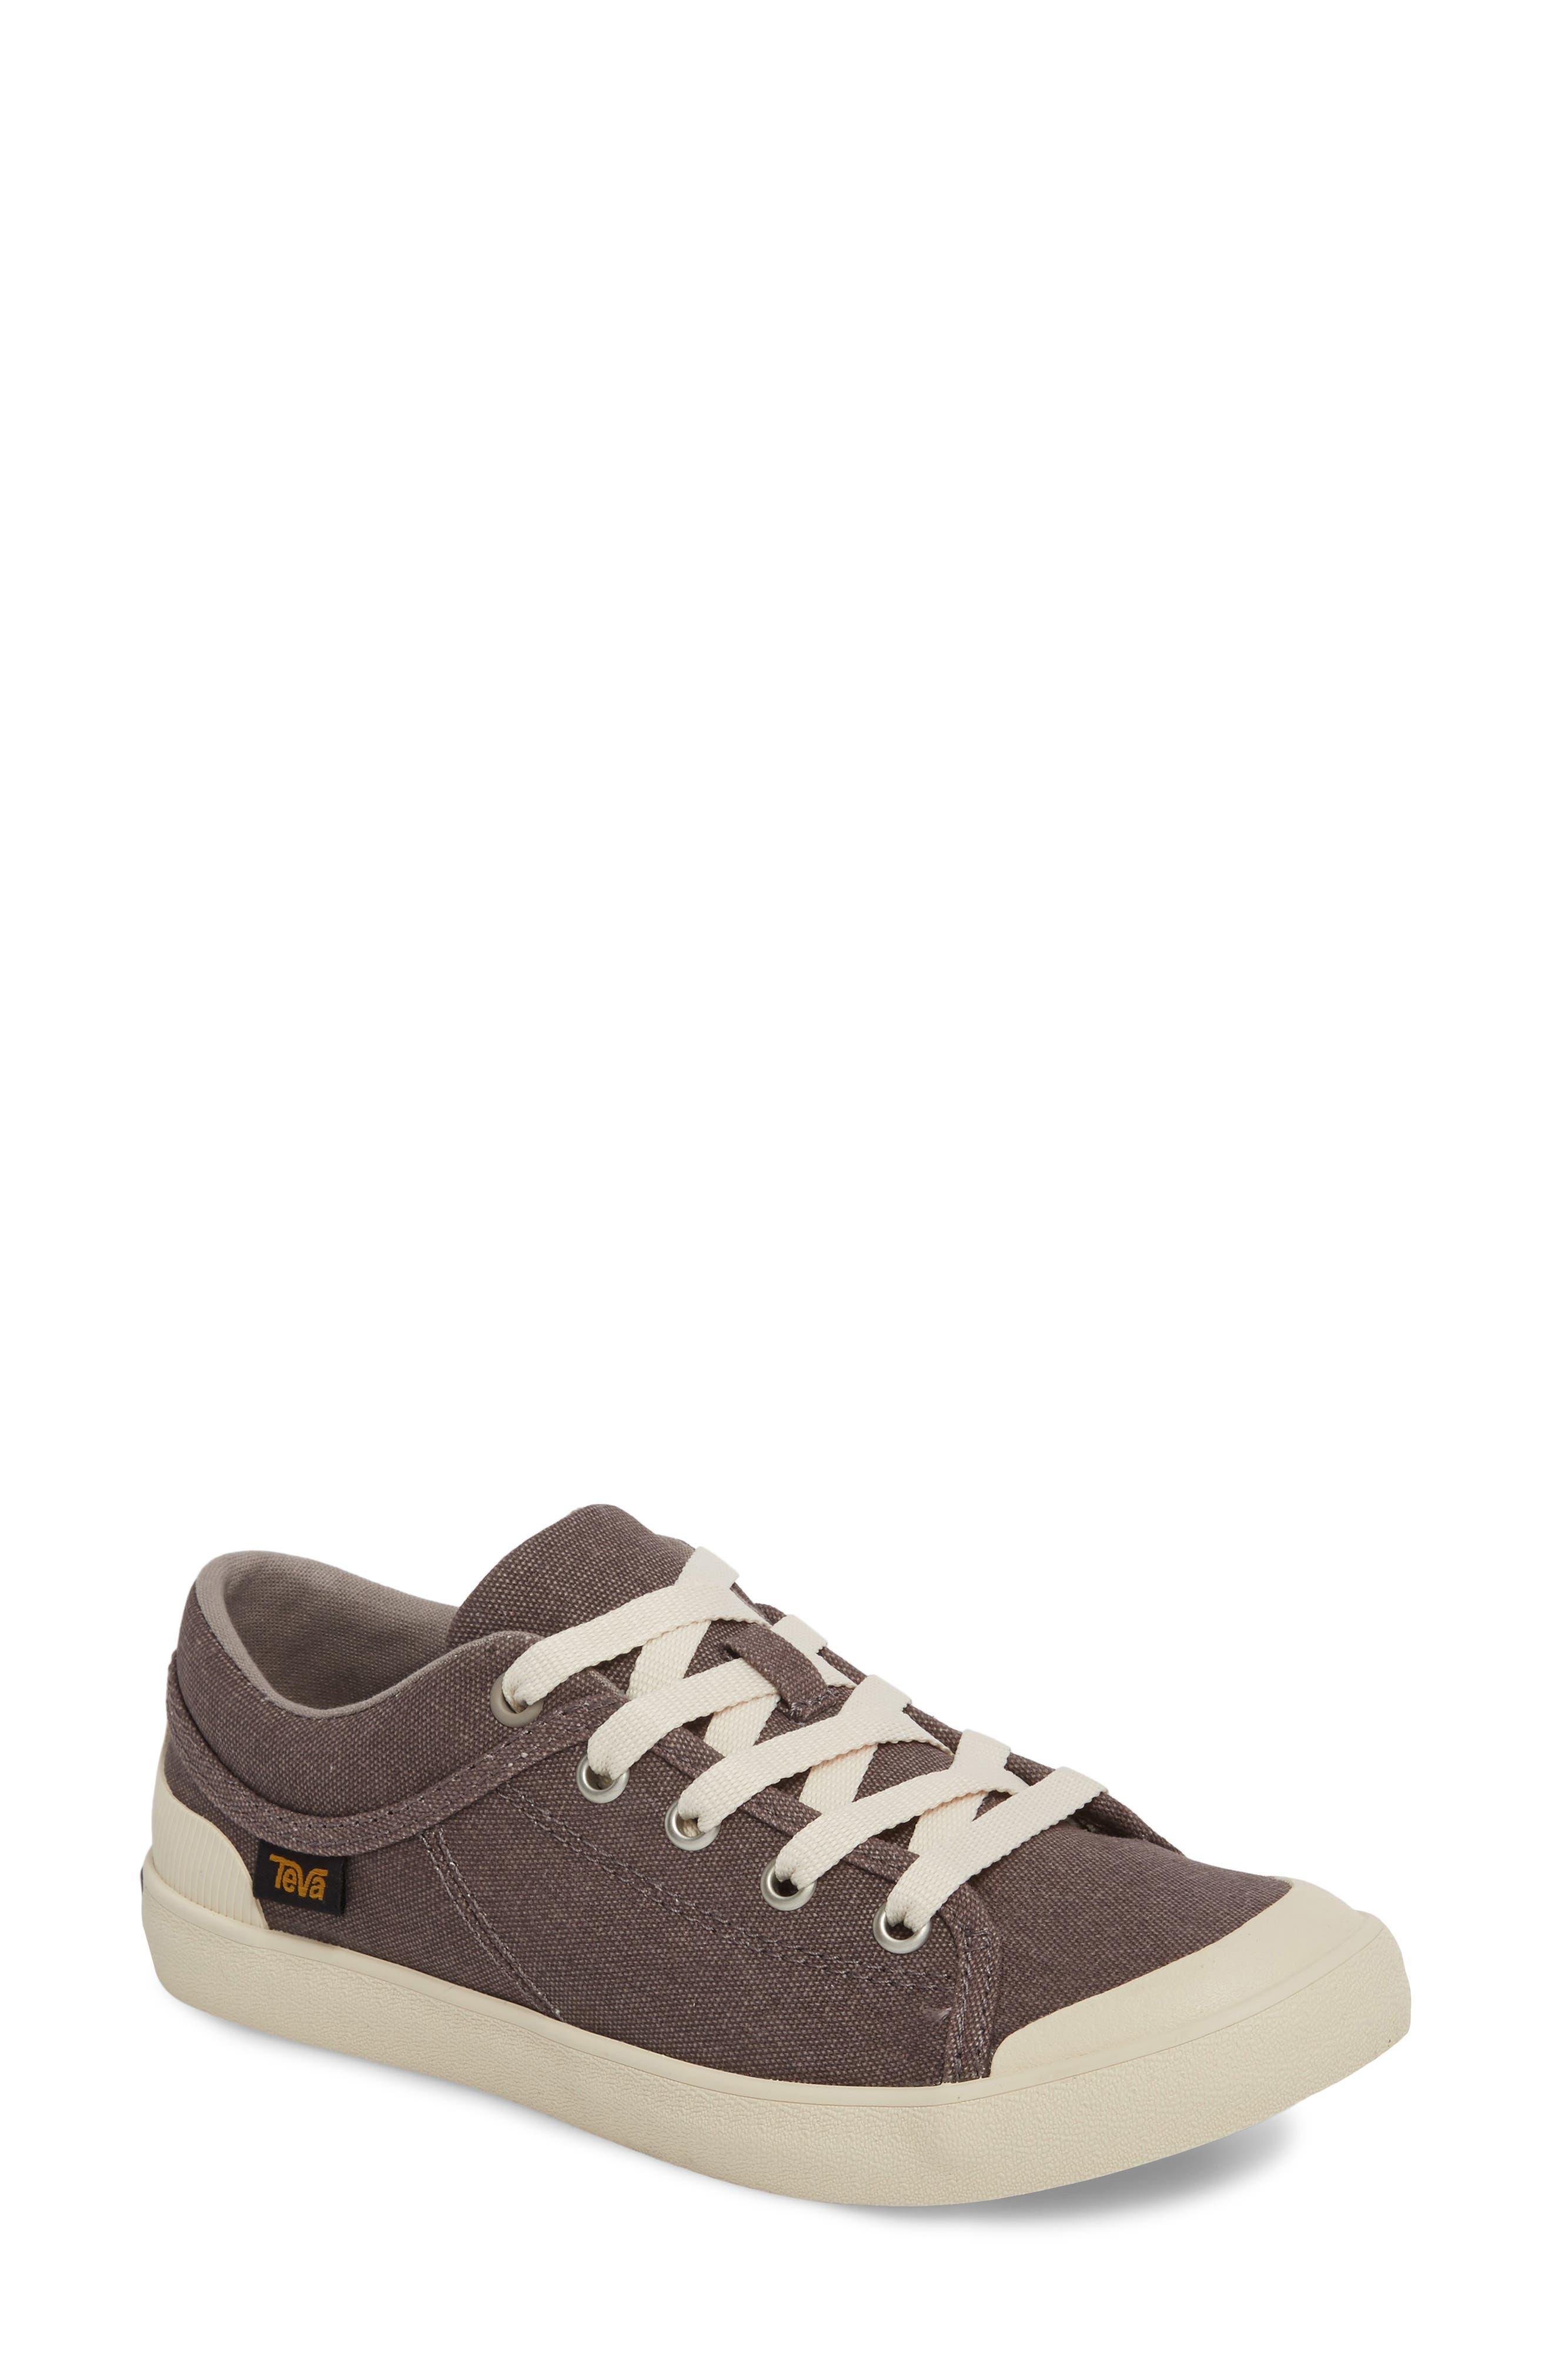 'Freewheel' Sneaker,                             Main thumbnail 1, color,                             Plum Truffle